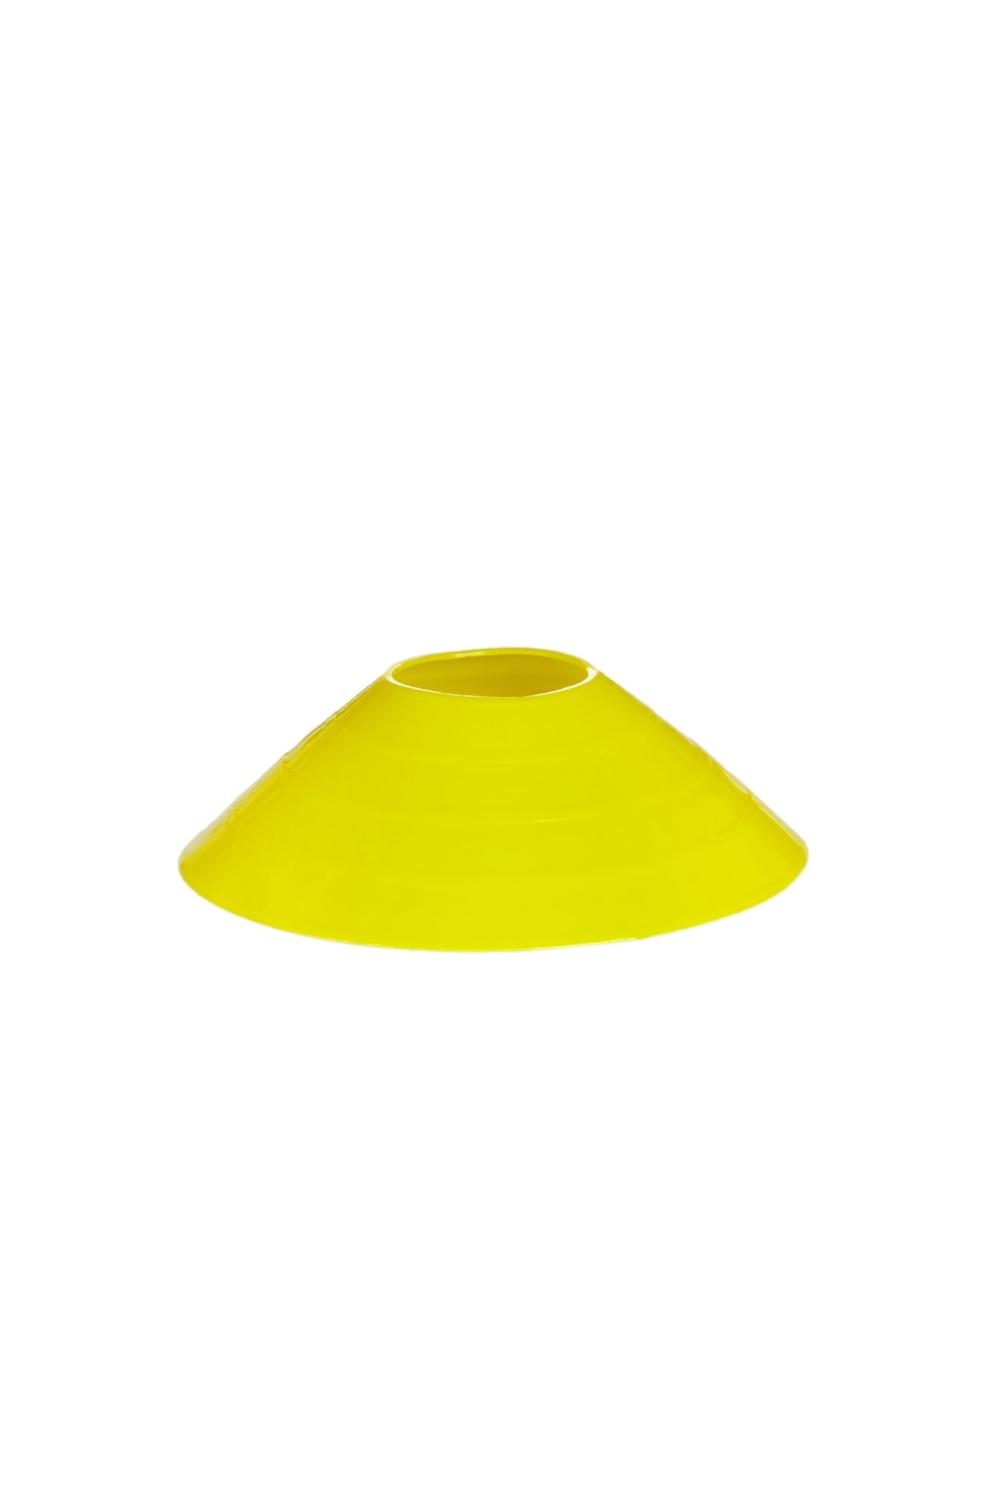 Soccer Cone Yellow.jpg